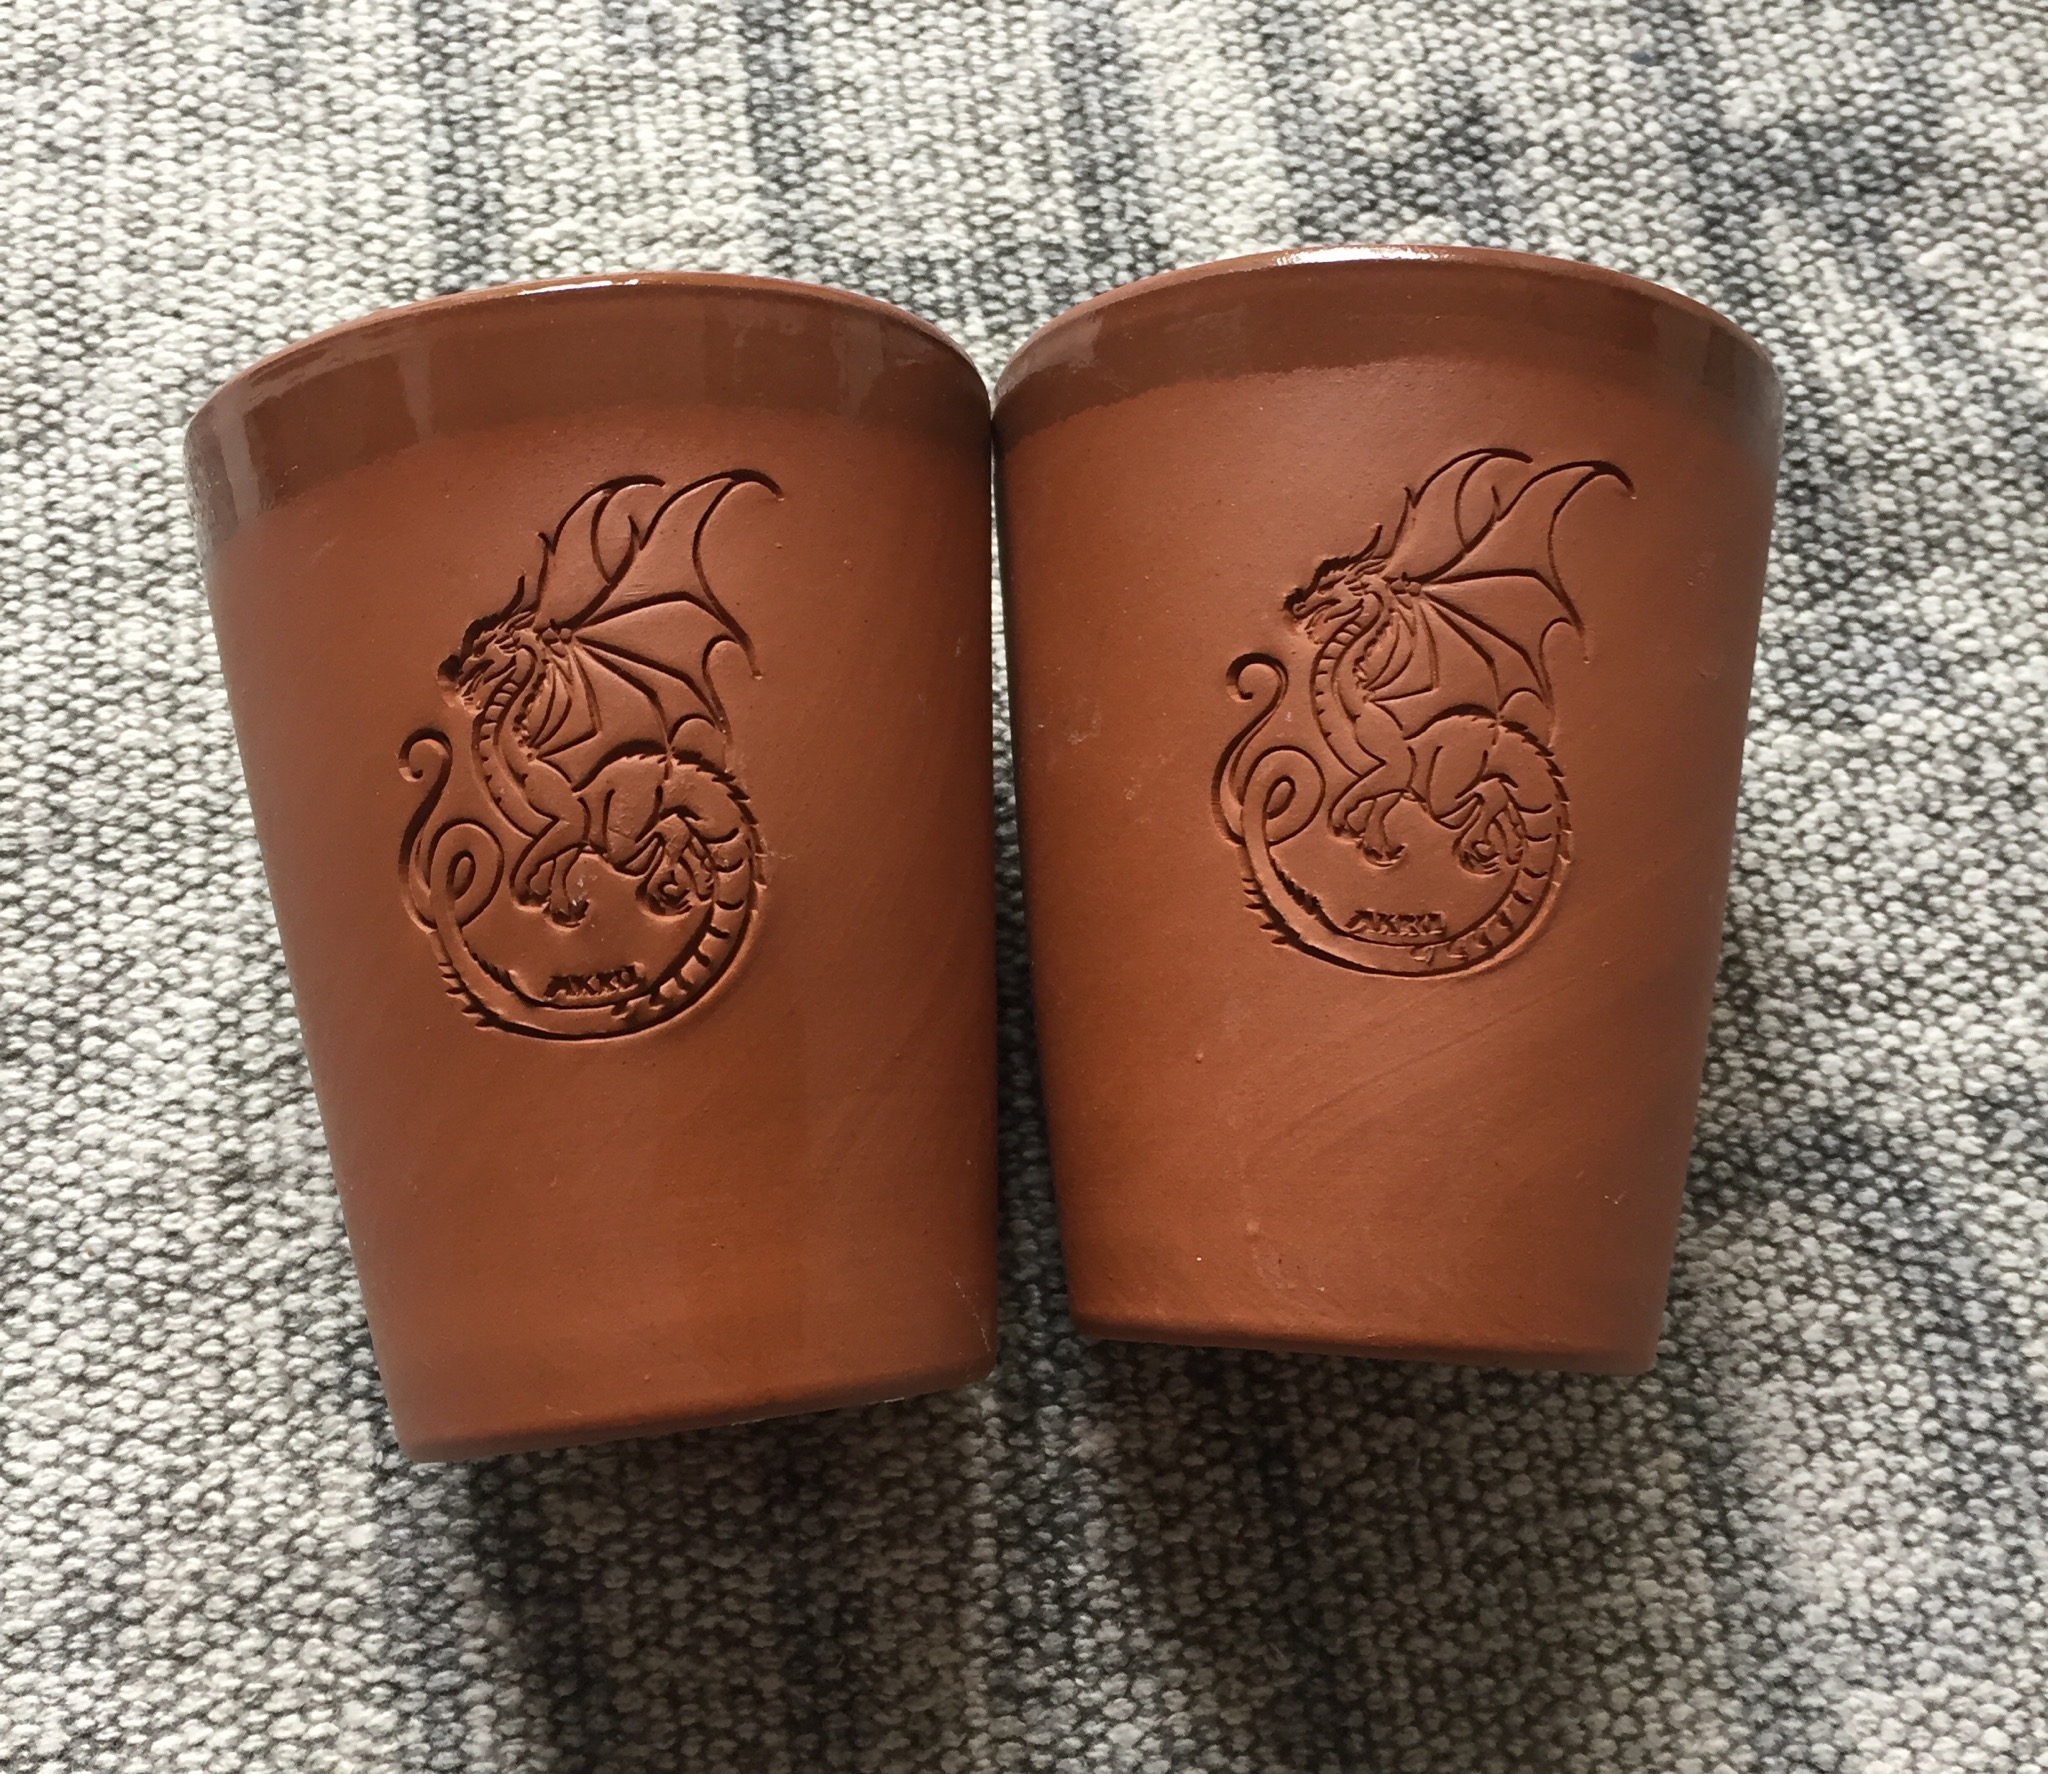 Keramikbecher tauschen